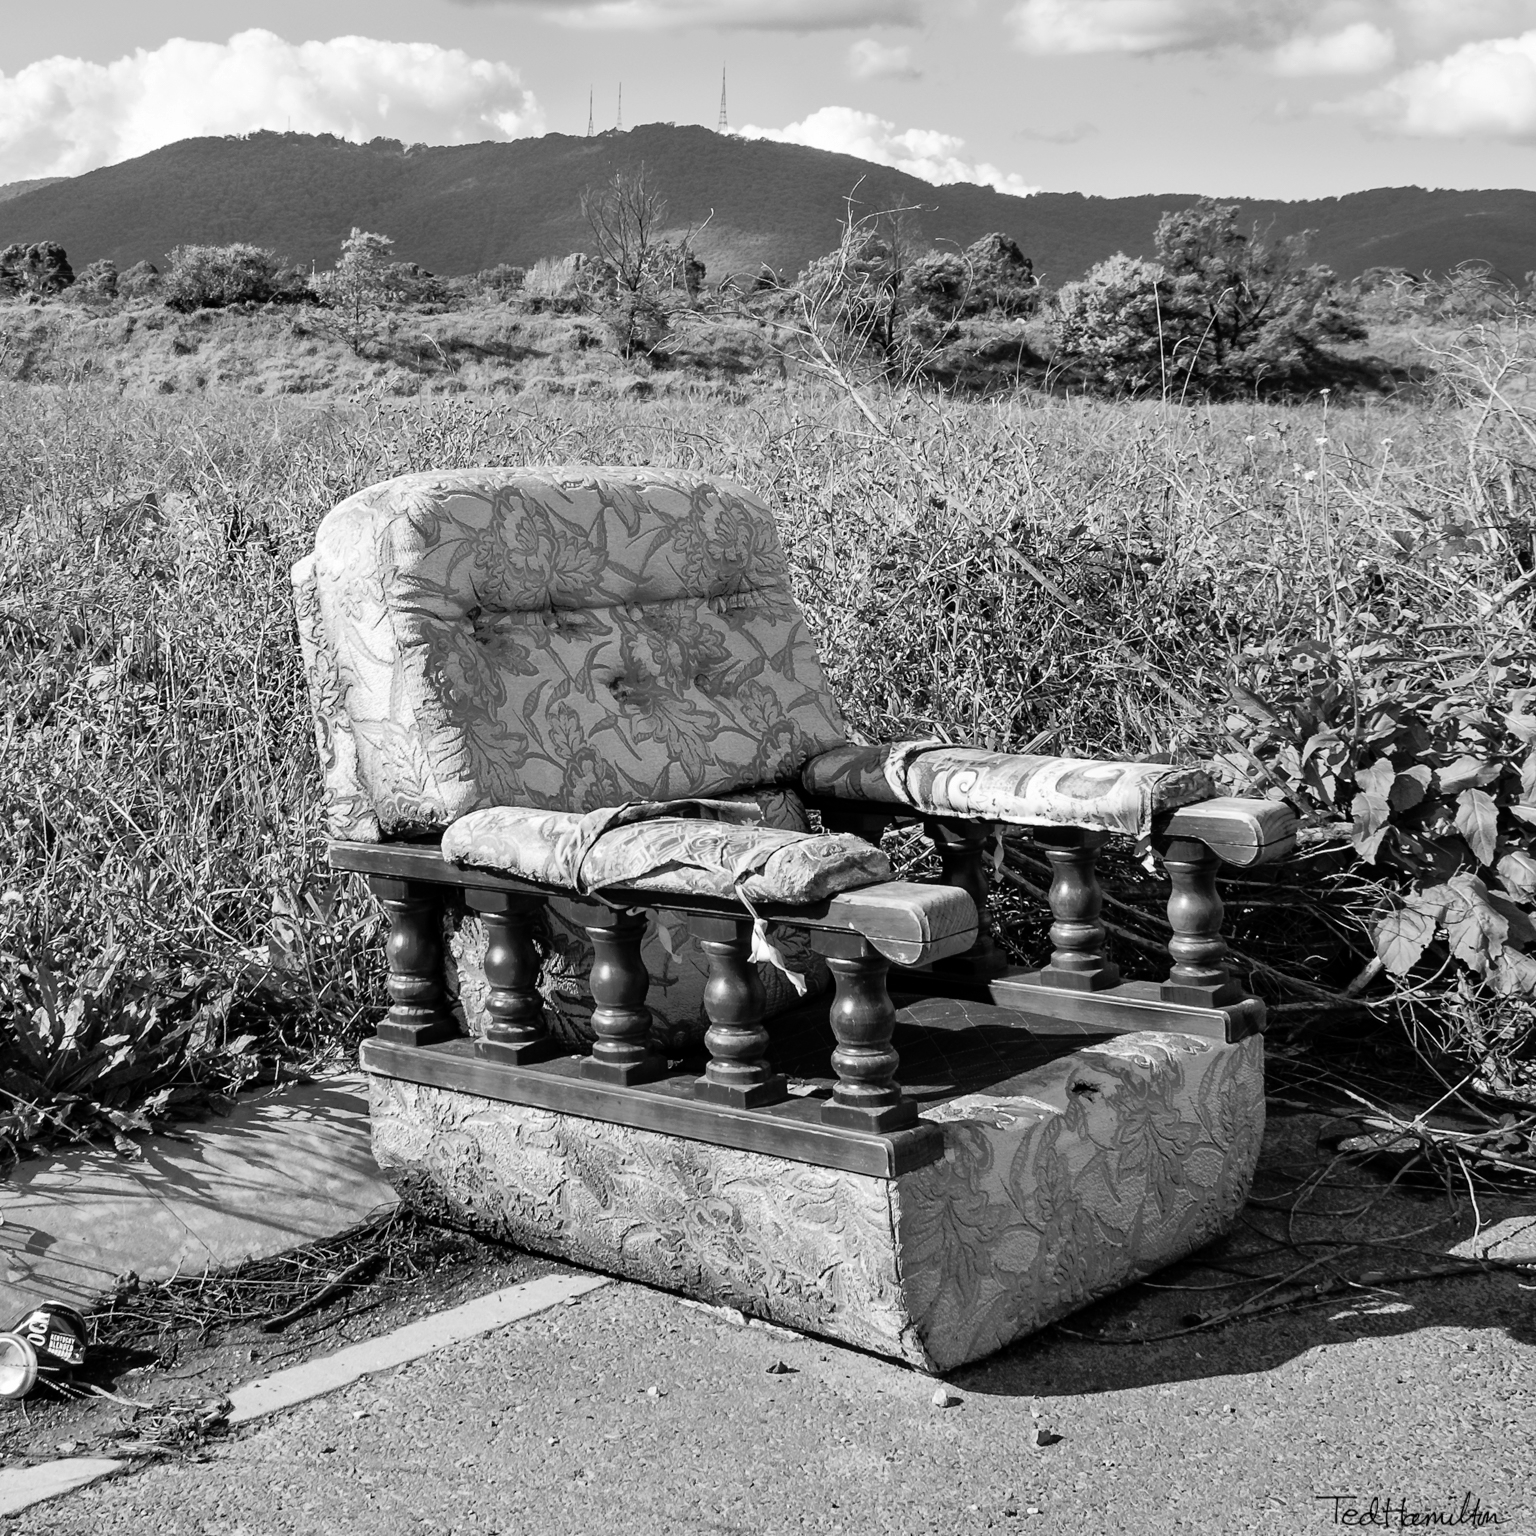 Room view. Abandoned chair view - tedhamilton | ello